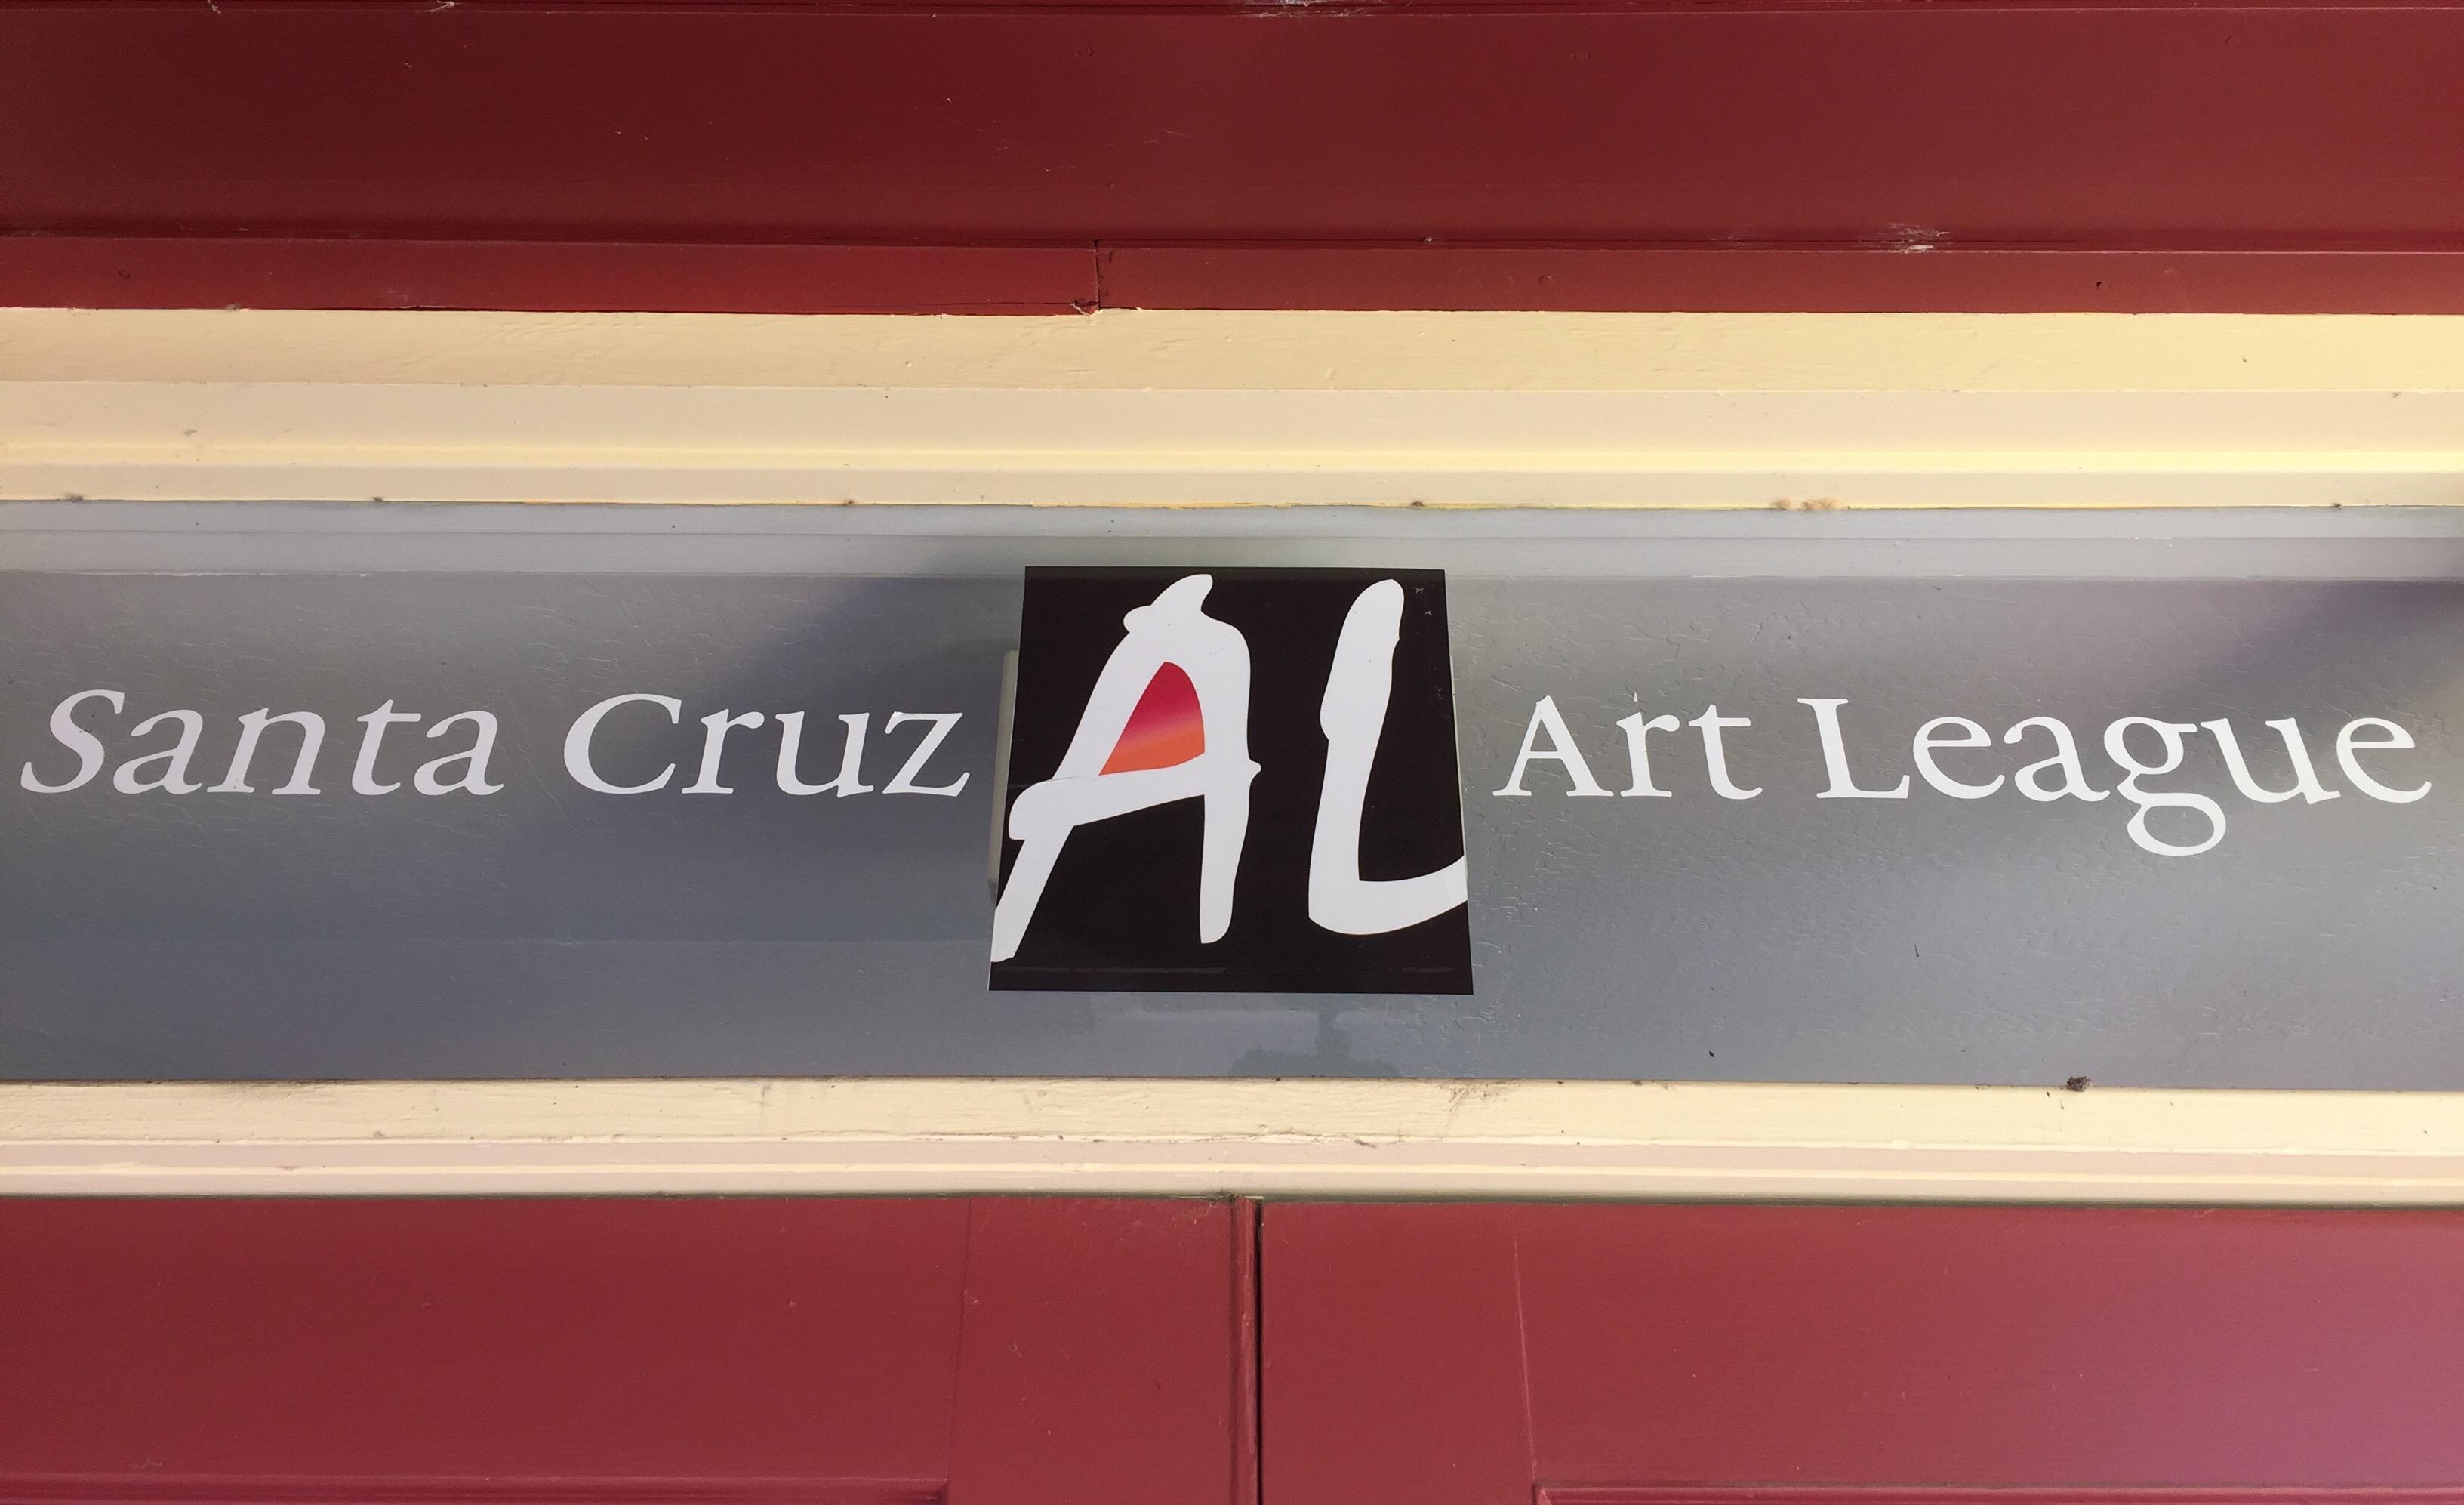 Art League